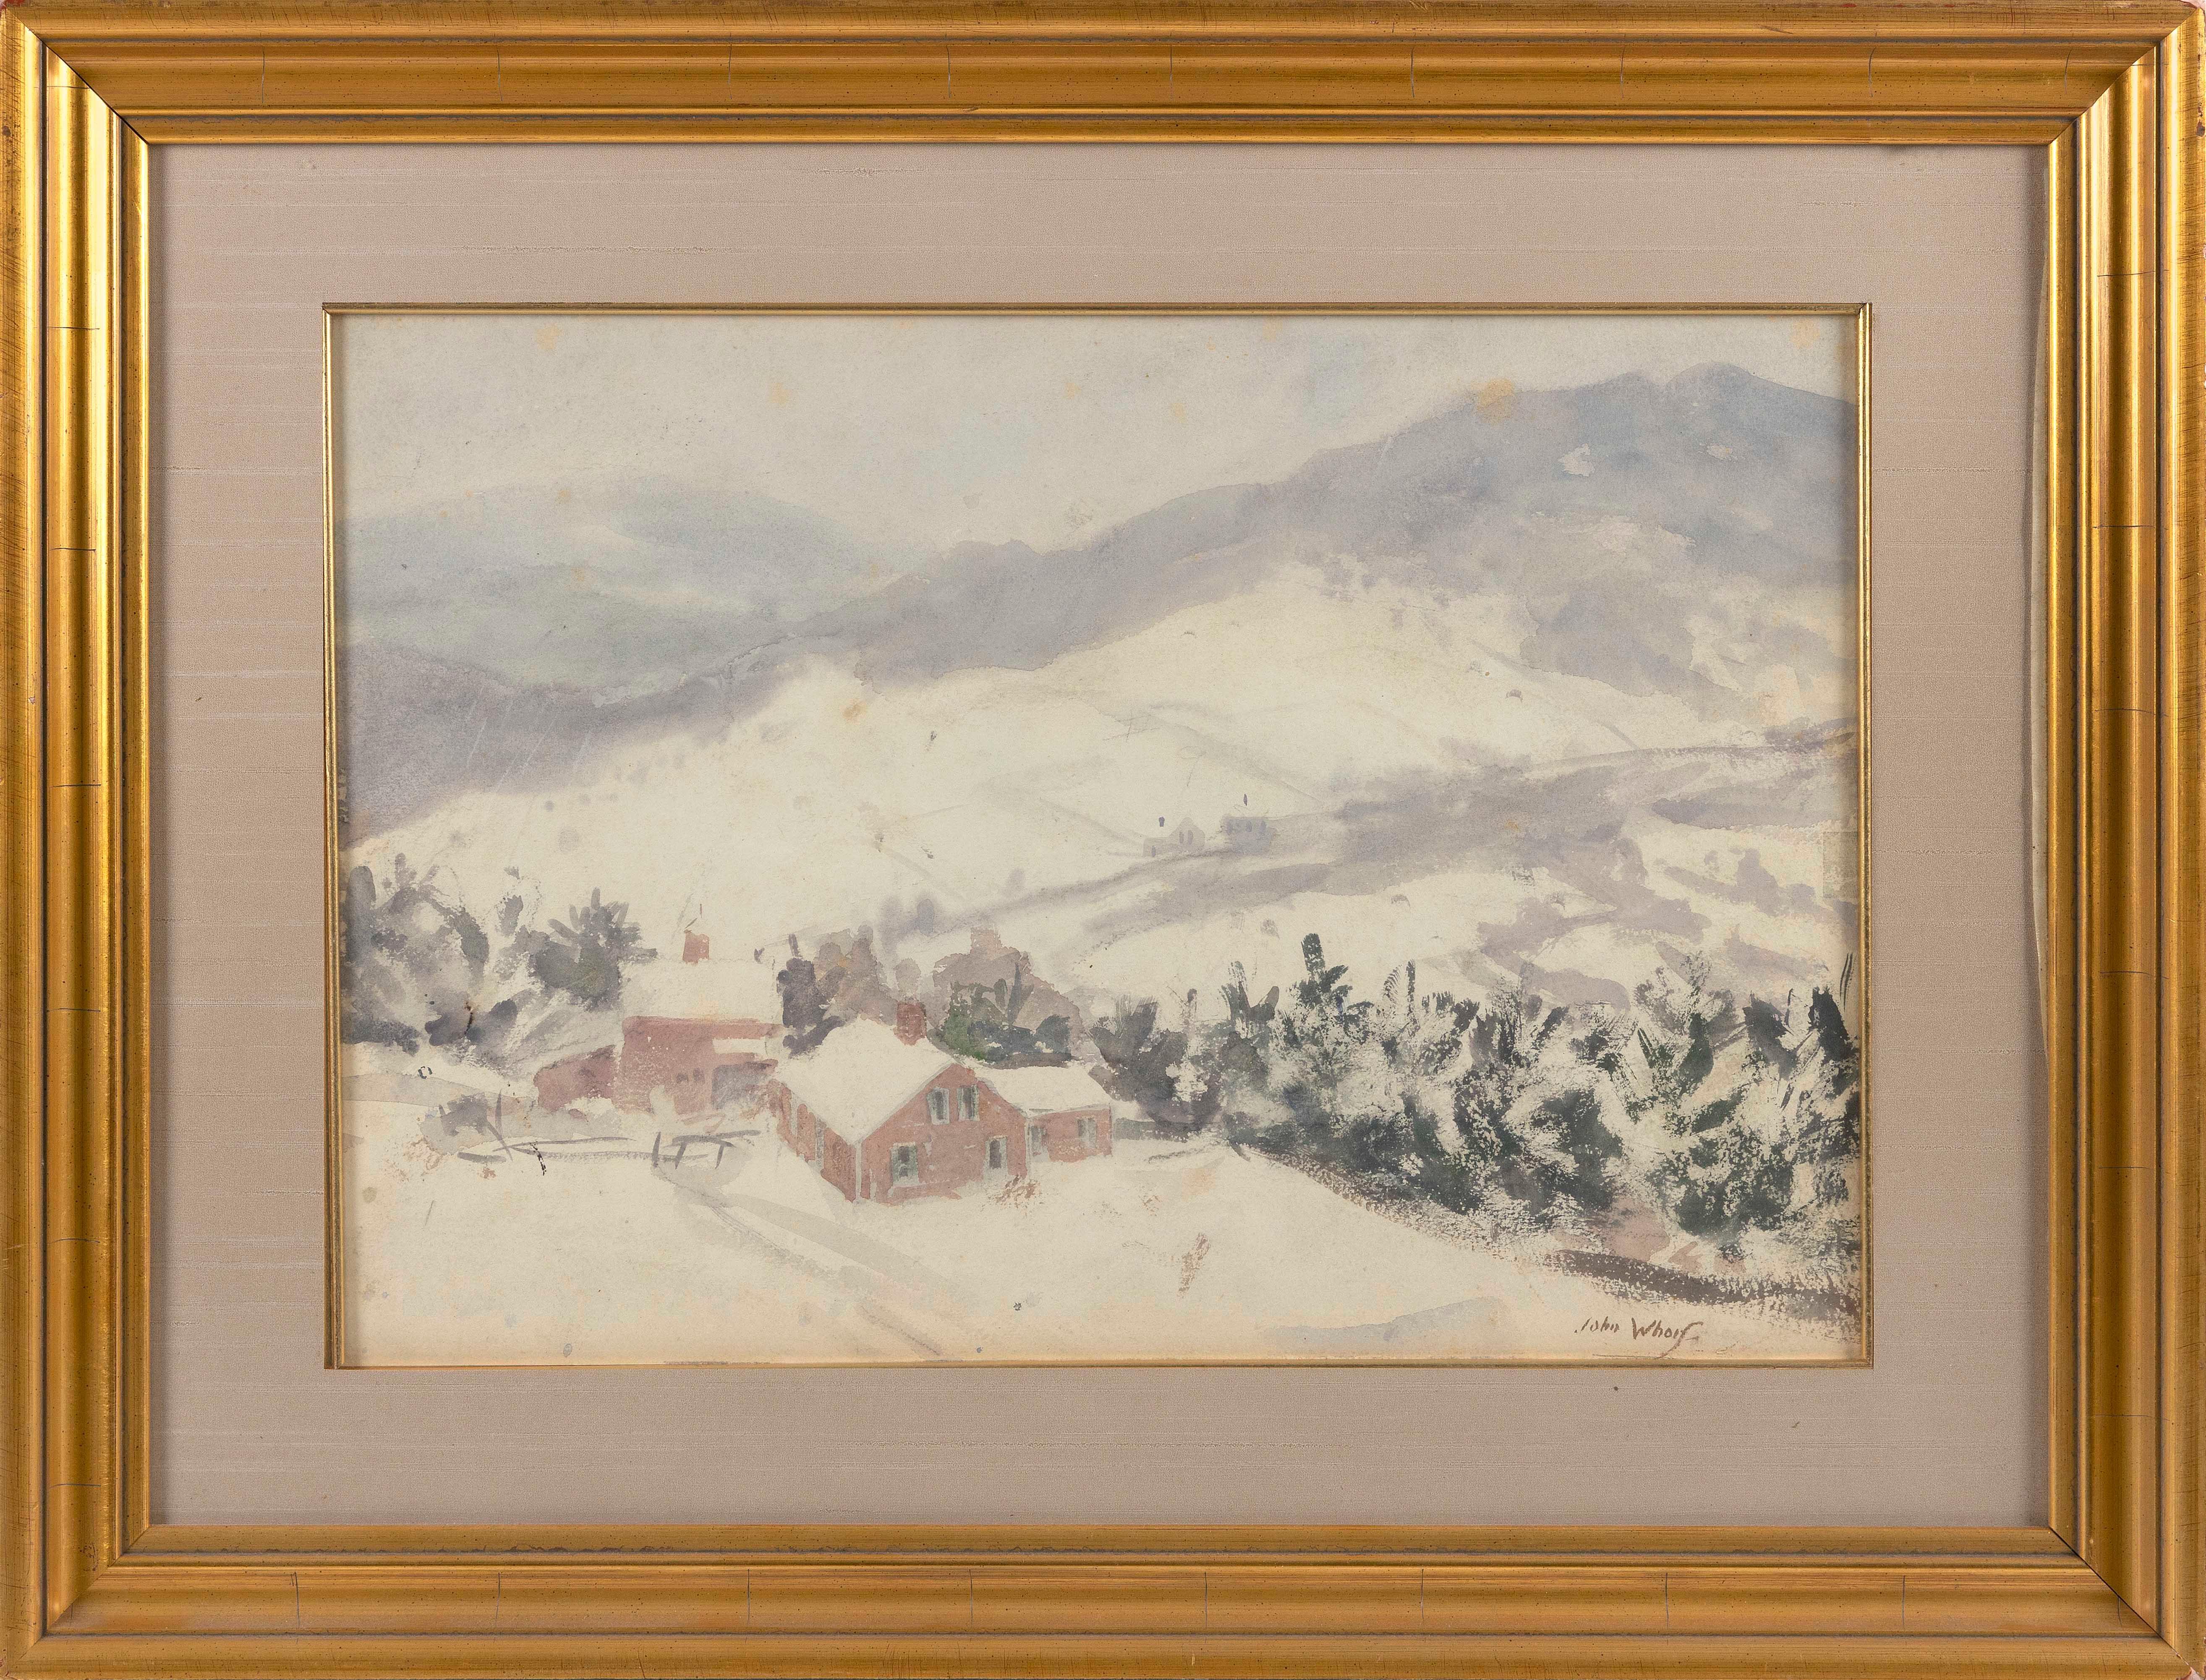 "JOHN WHORF , Massachusetts, 1903-1959, Farm in winter., Watercolor on paper, 14"" x 20"" sight. Framed 22"" x 29""."